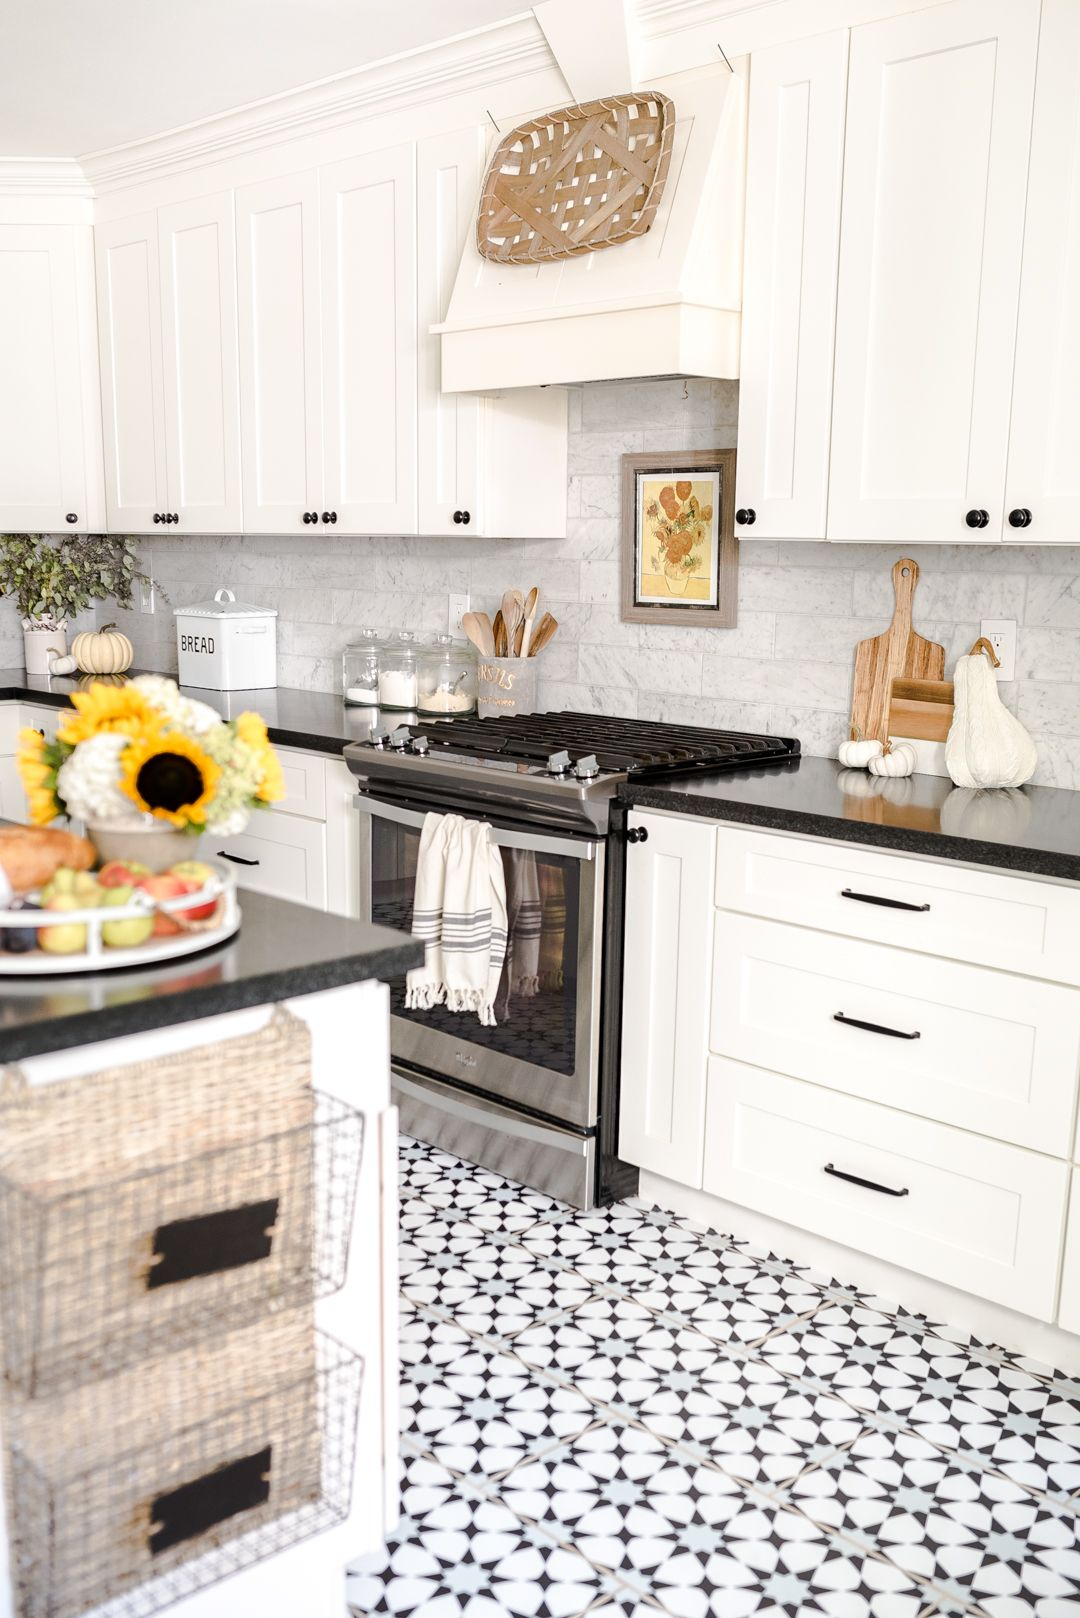 Early Fall Kitchen Decorating Ideas Sunflowers Hydrangeas